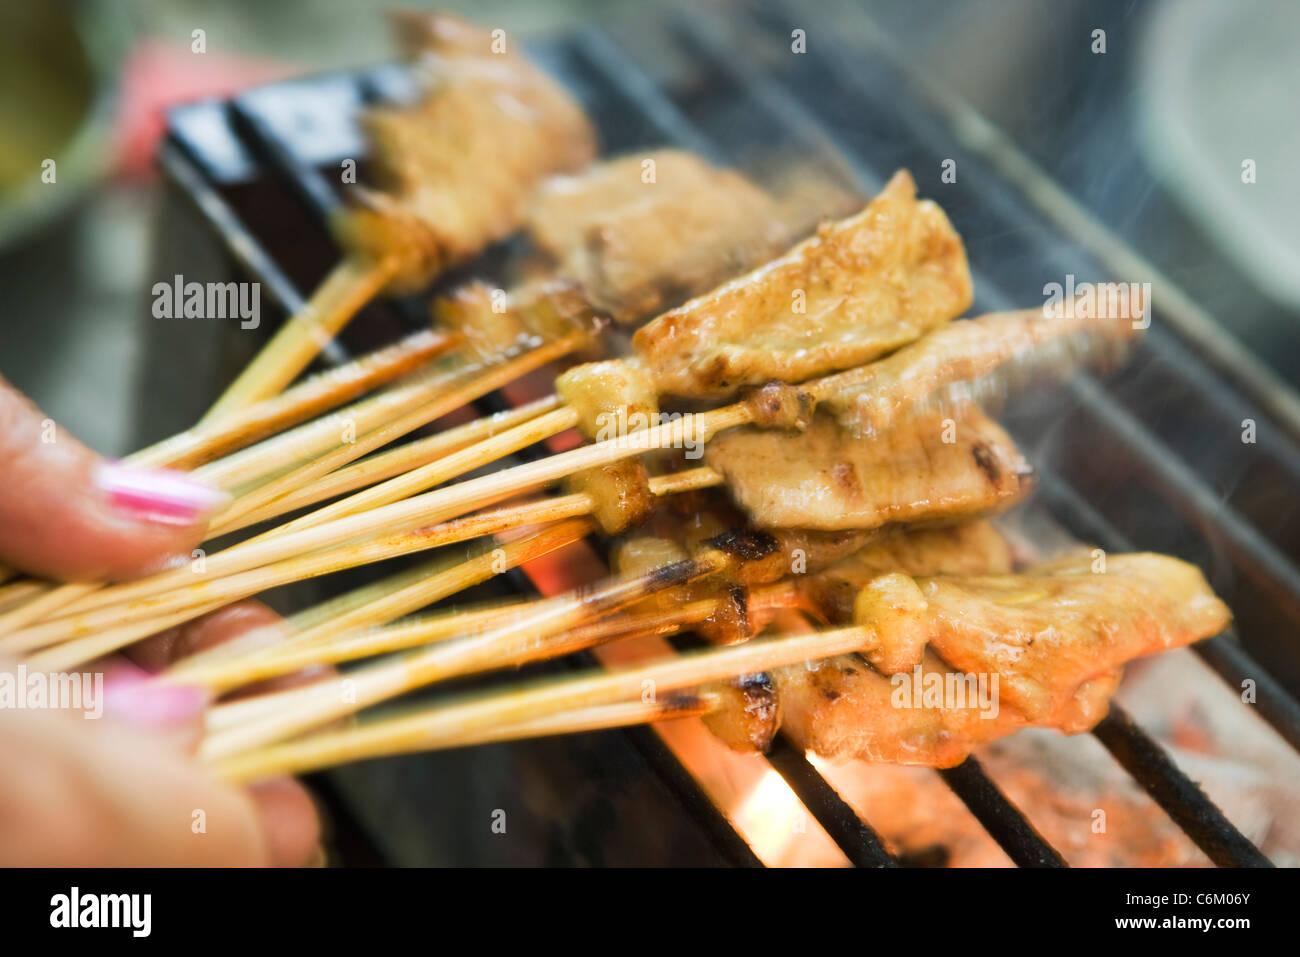 Grilling pork skewers - Stock Image